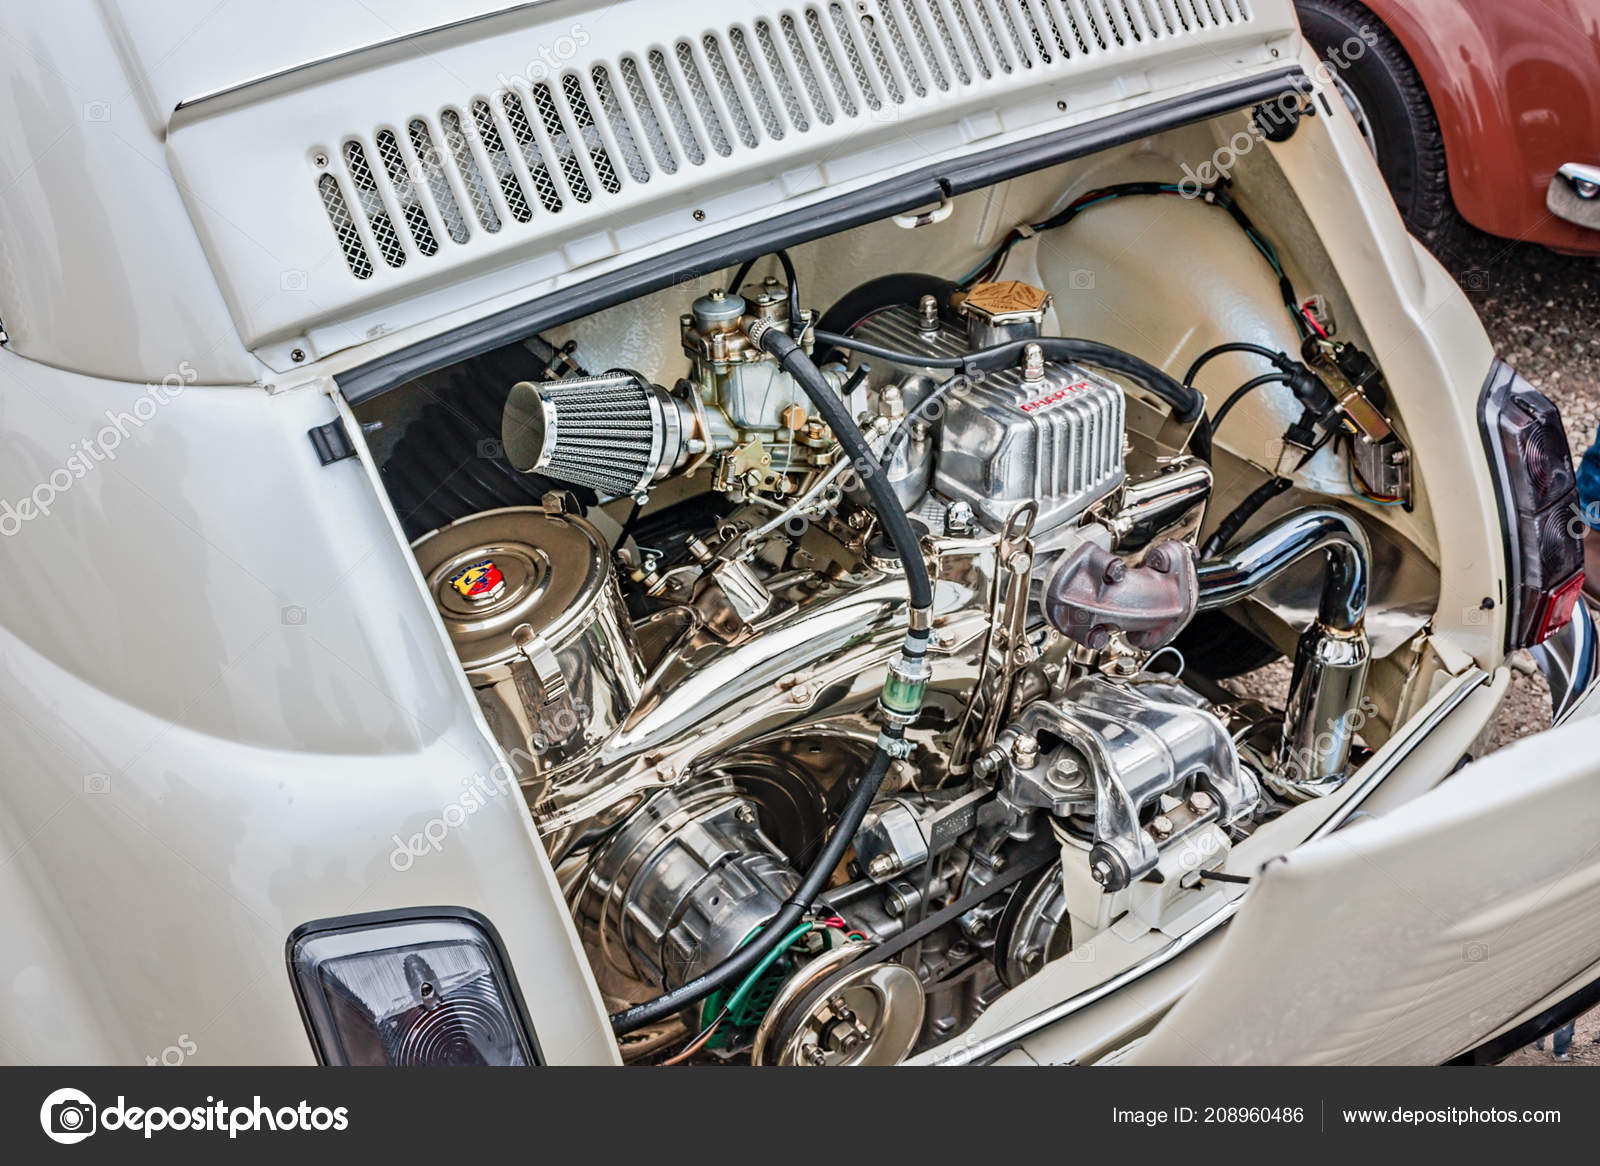 Shiny Chromed Abarth Engine Tuned Vintage Car Fiat 500 Parked